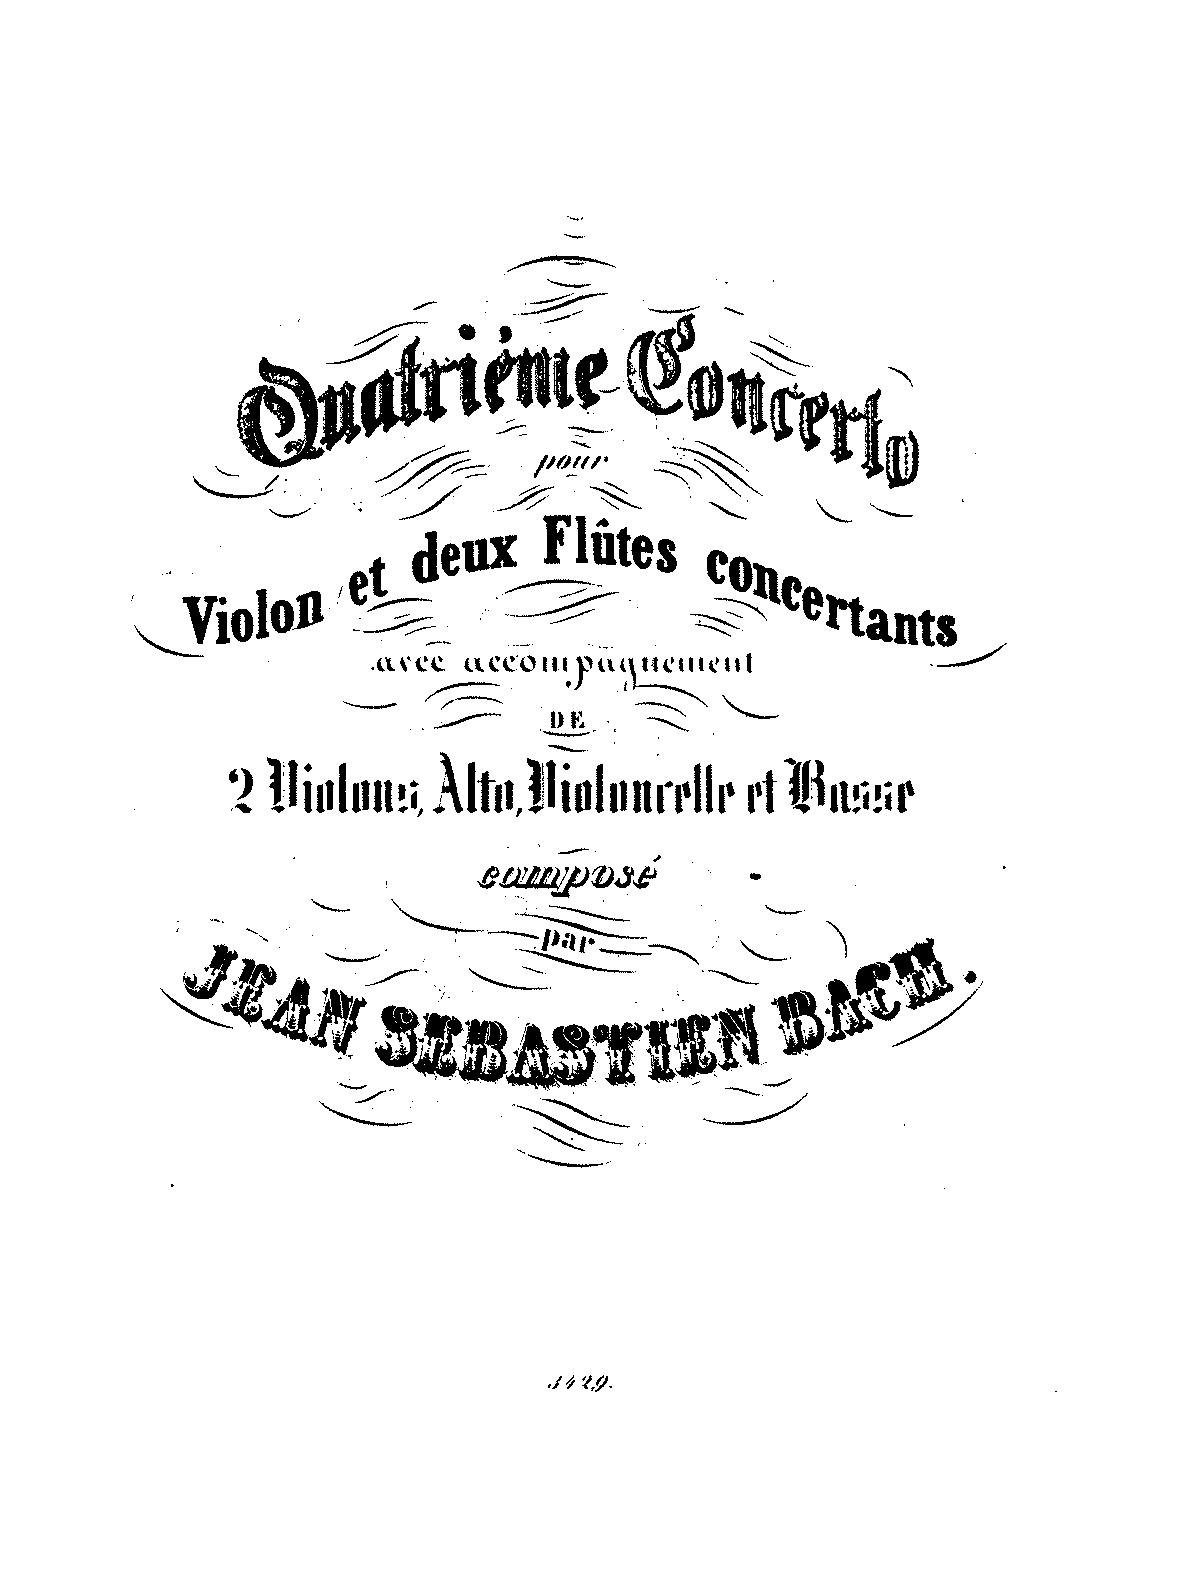 js bach brandenburg concerto no 5 analysis